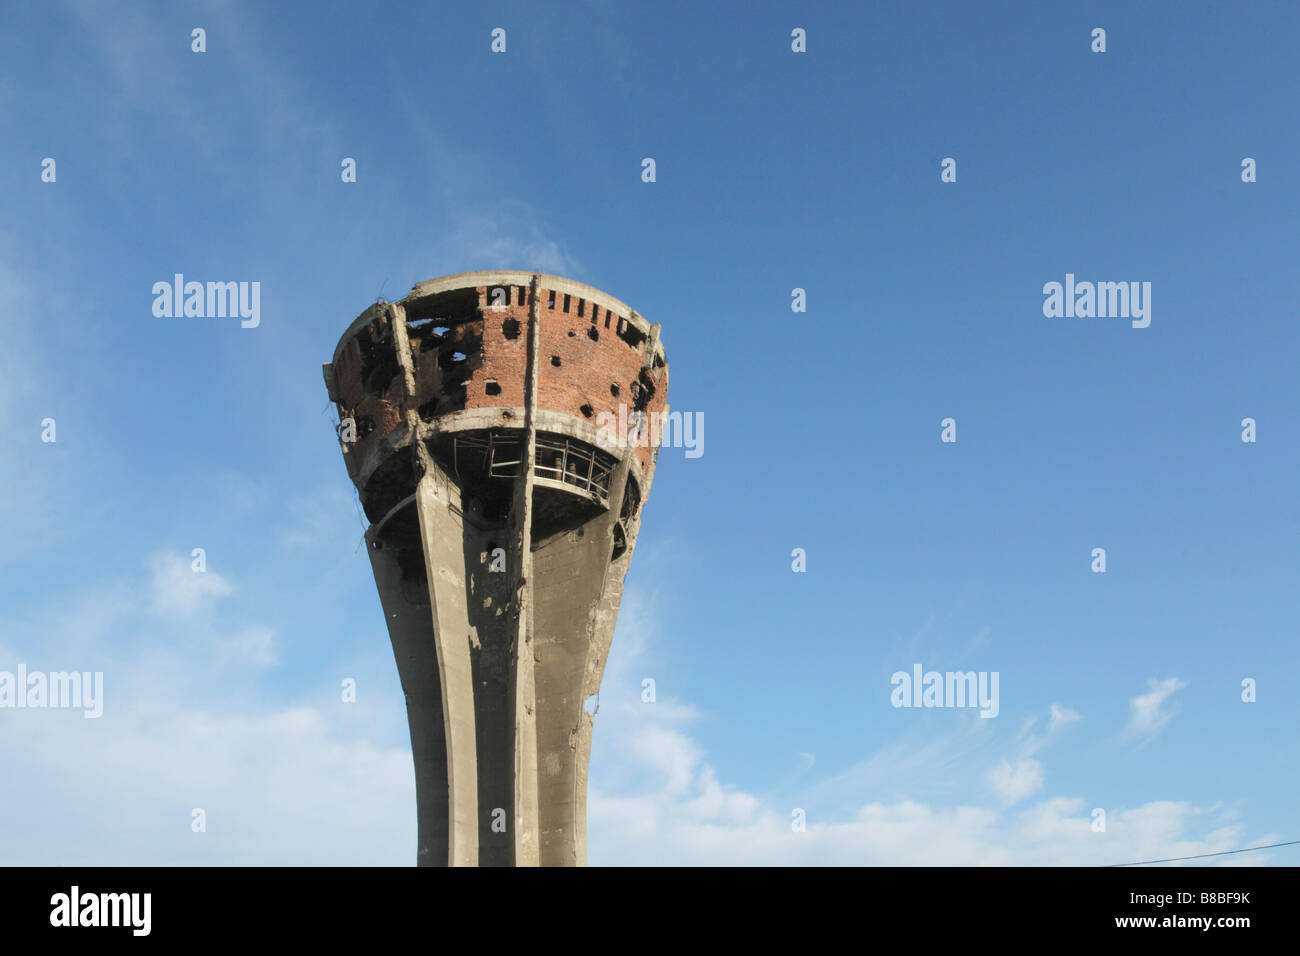 Water Tower Damaged from War 1990's, Vukovar, Eastern Croatia Stock Photo